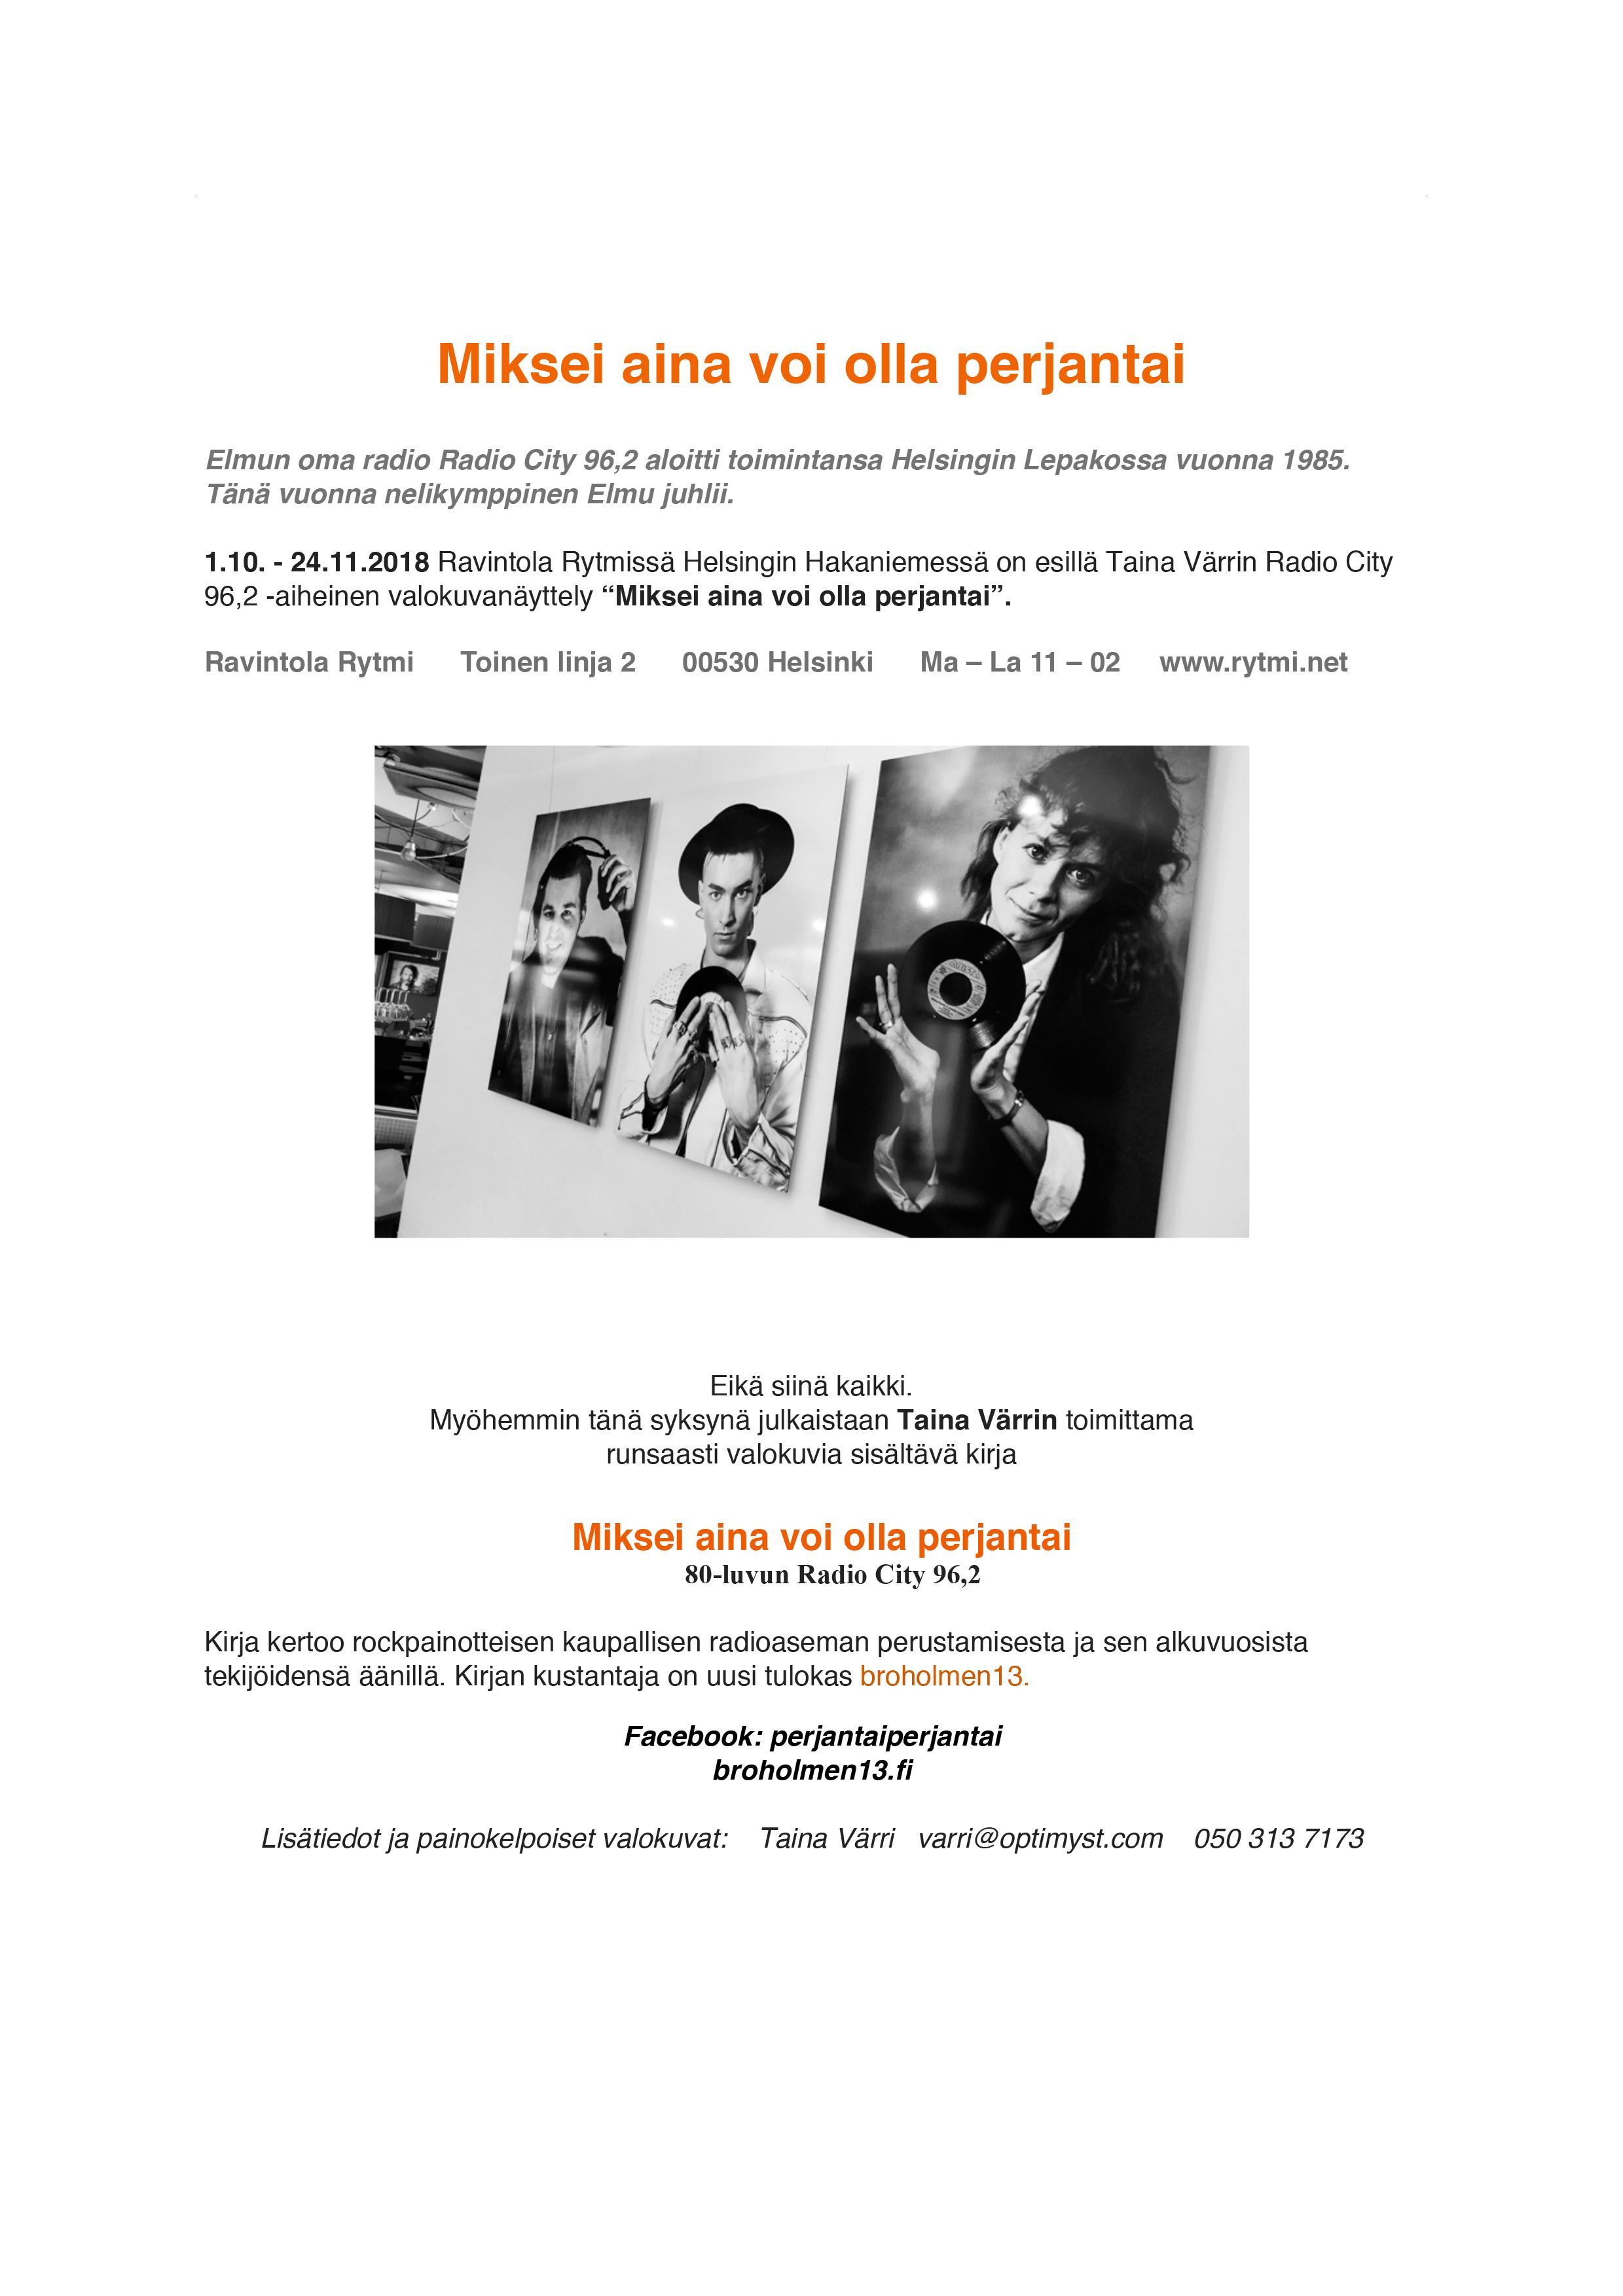 TIEDOTE-Miksei-aina-Taina-Värri-80-luvun-Radio-City-962.png